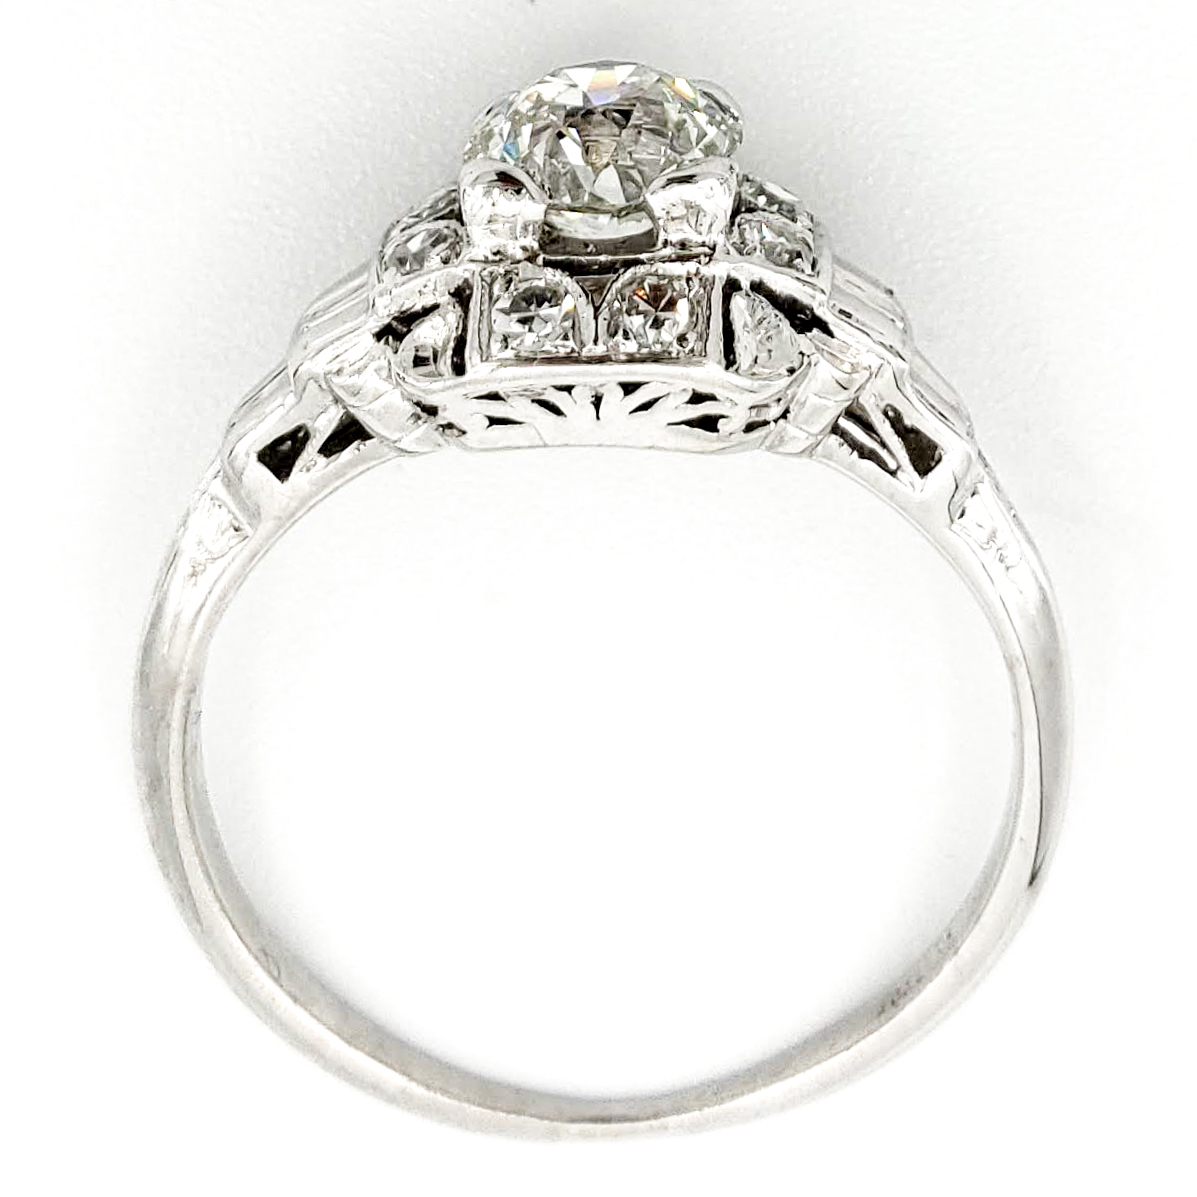 Vintage Platinum Engagement Ring With 0.69 Carat Old European Cut Diamond EGL – H VS2